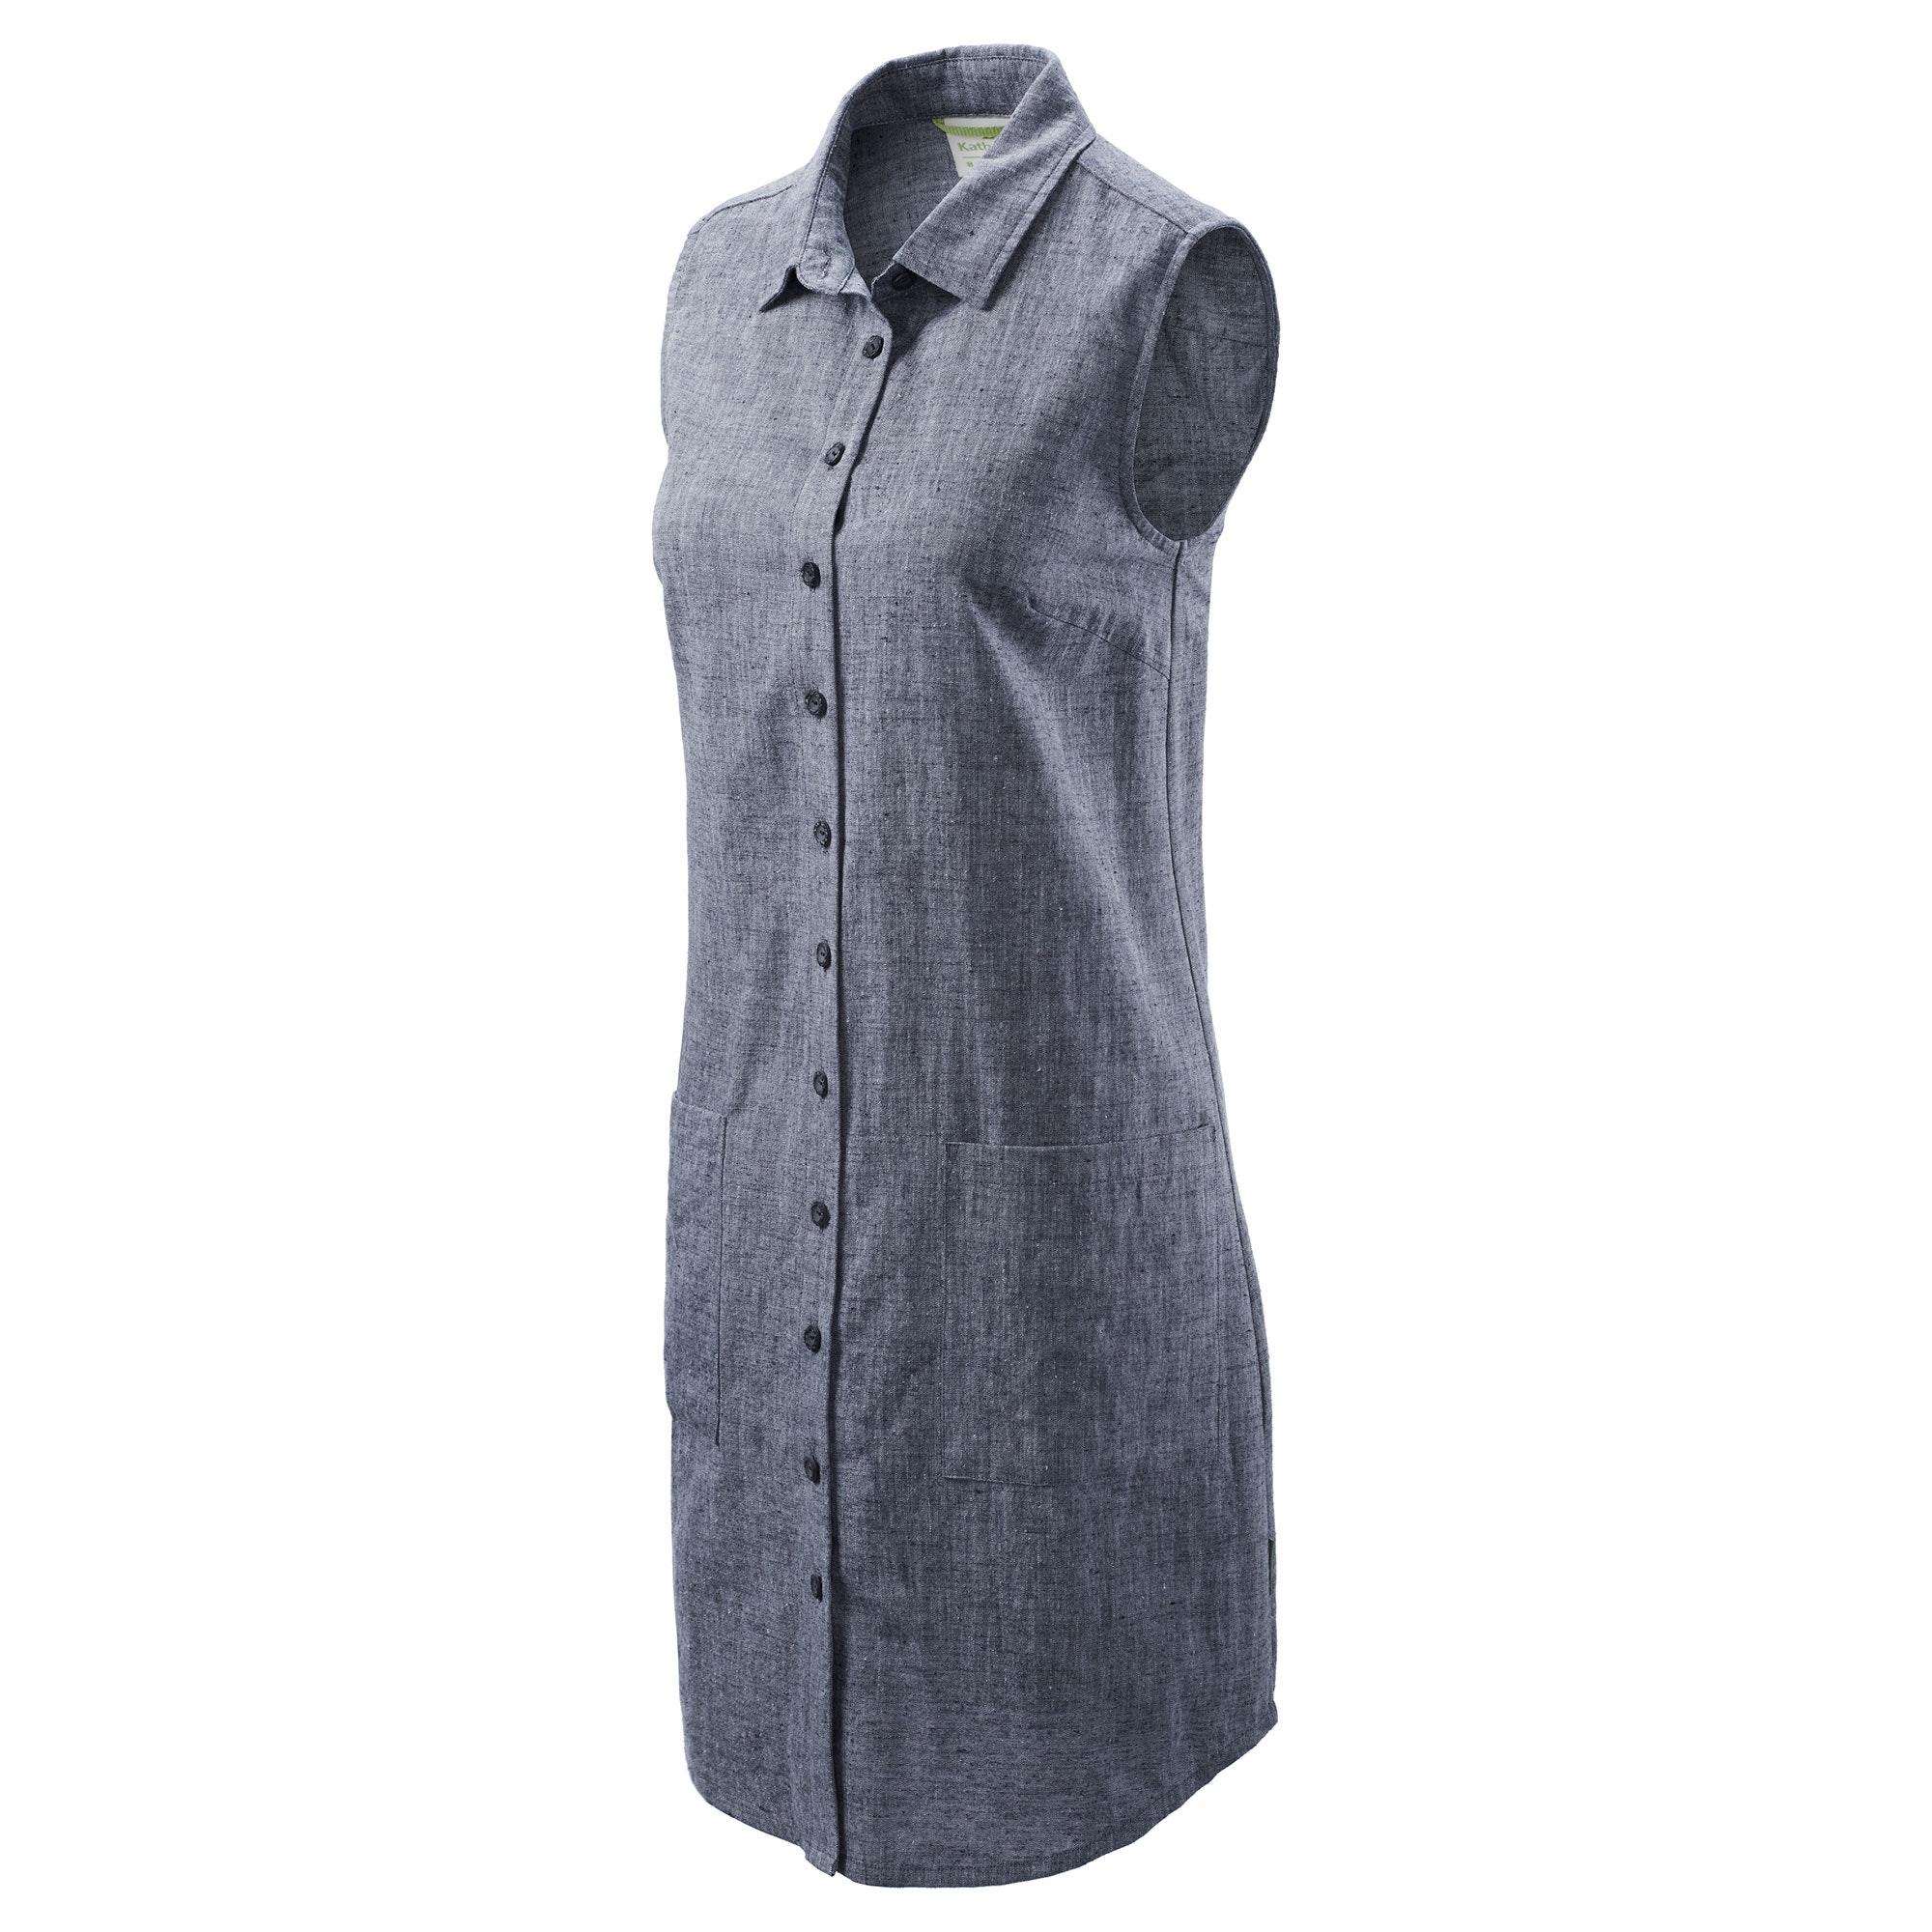 NEW-Kathmandu-RFIDtech-Women-Organic-Cotton-Hemp-Sleeveless-Button-Down-A-Line thumbnail 8